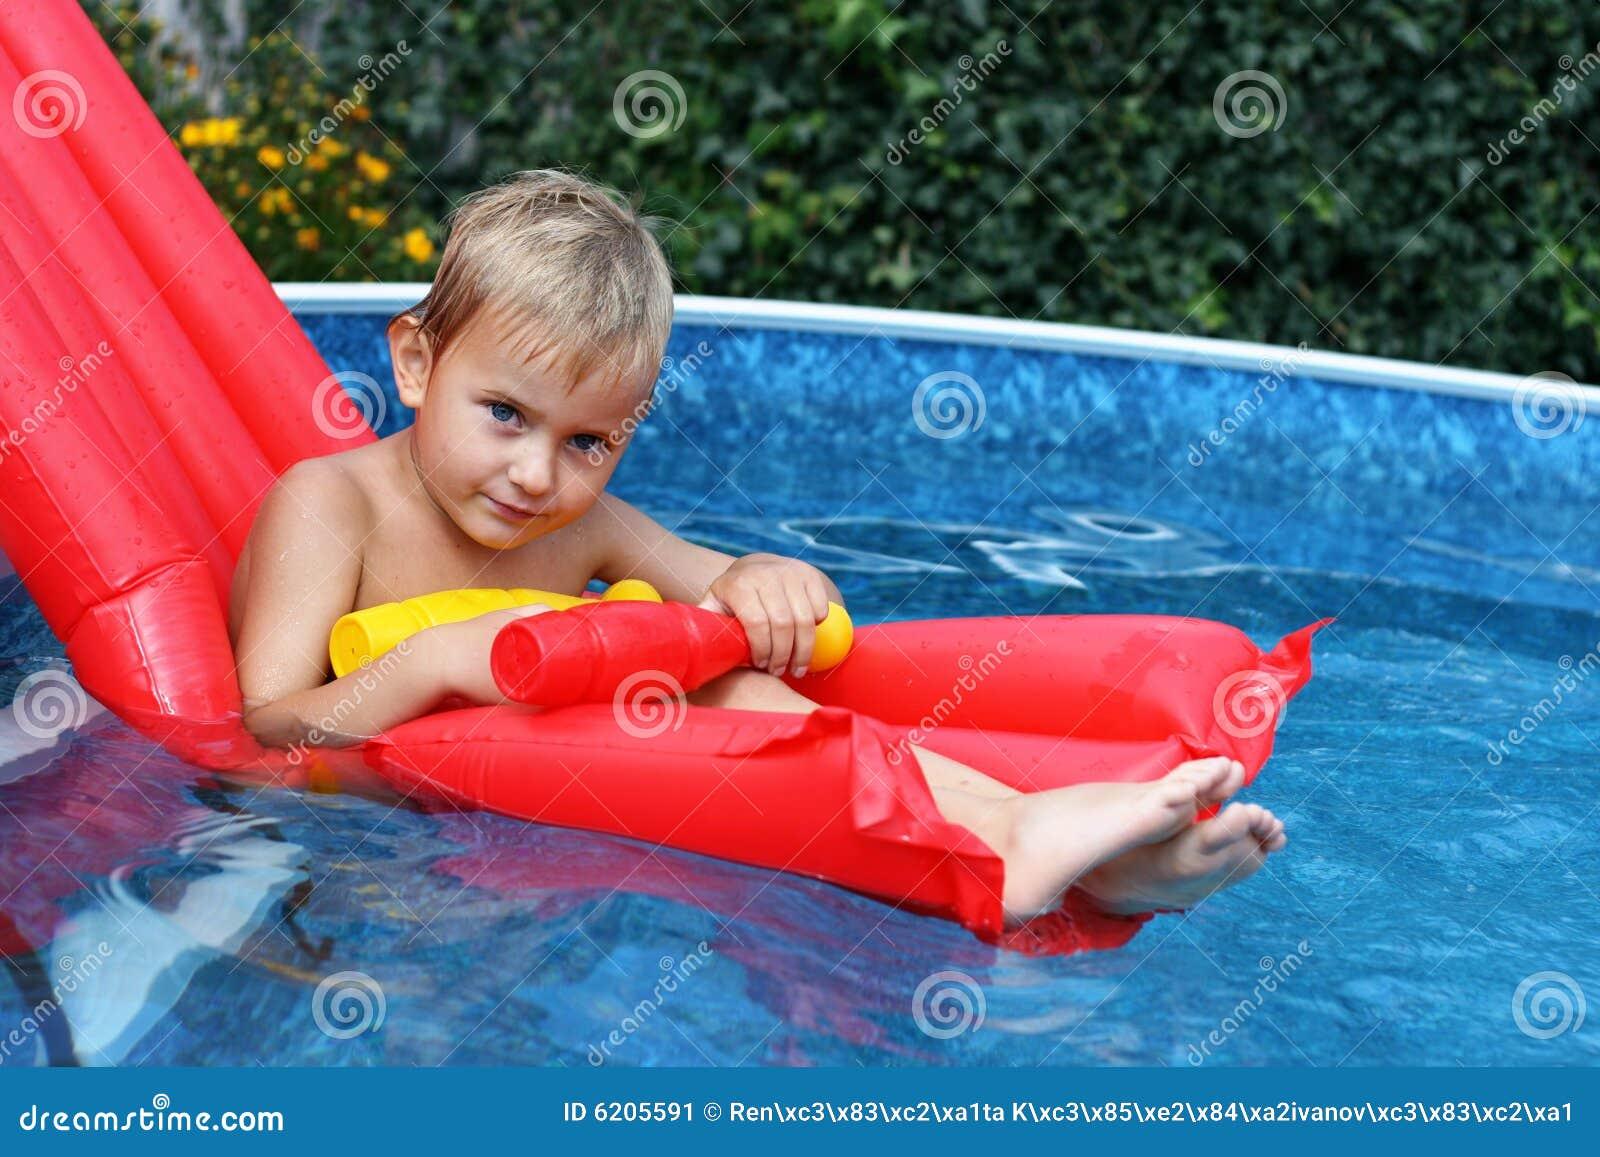 Junge im Swimmingpool